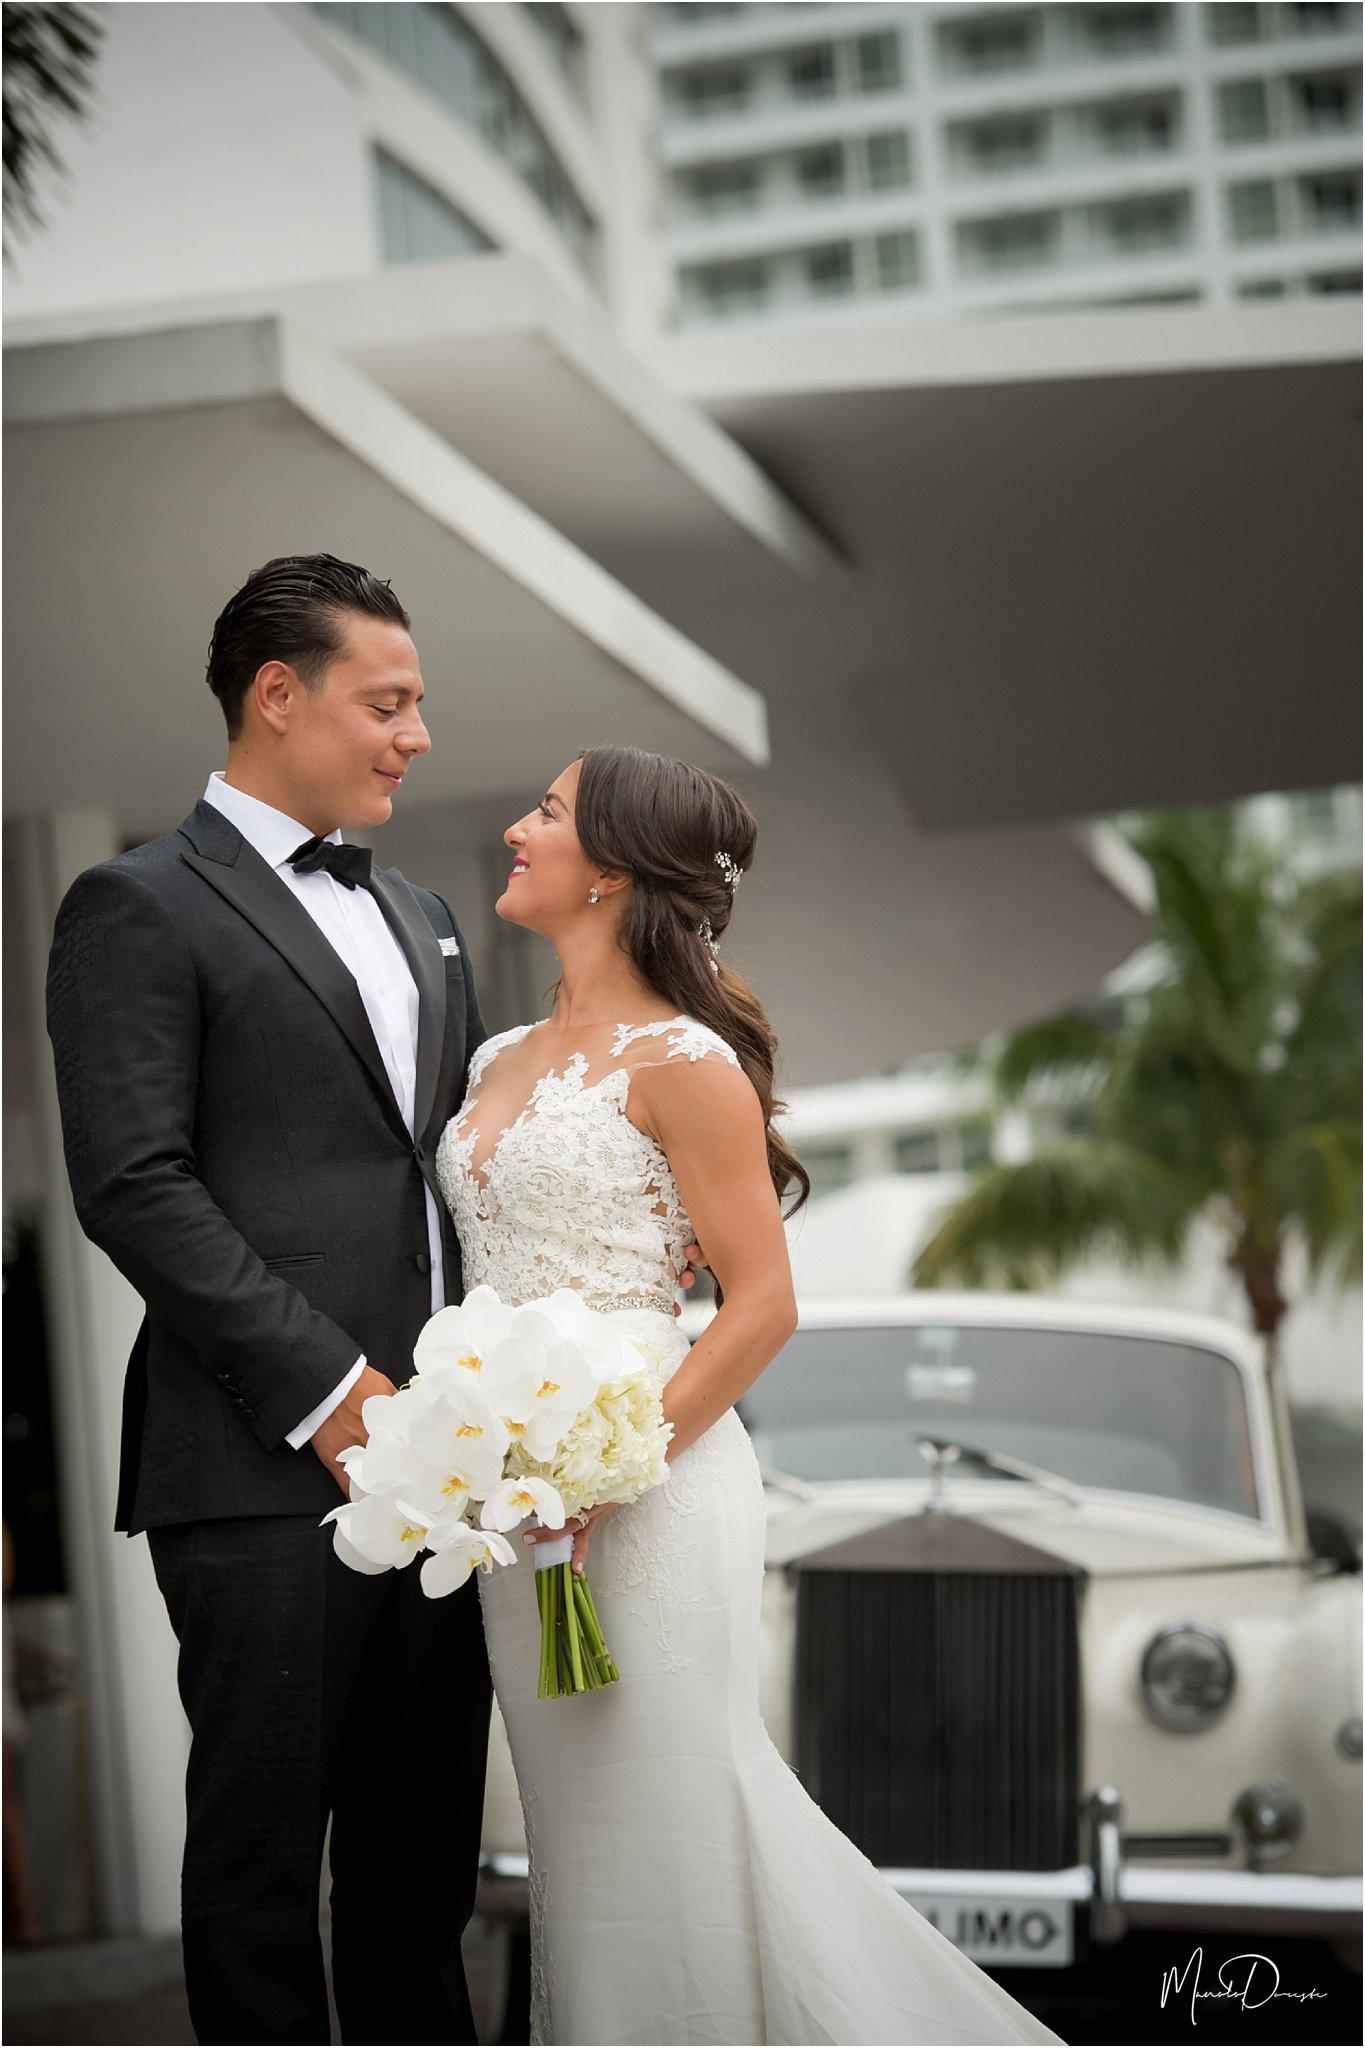 0323_ManoloDoreste_InFocusStudios_Wedding_Family_Photography_Miami_MiamiPhotographer.jpg